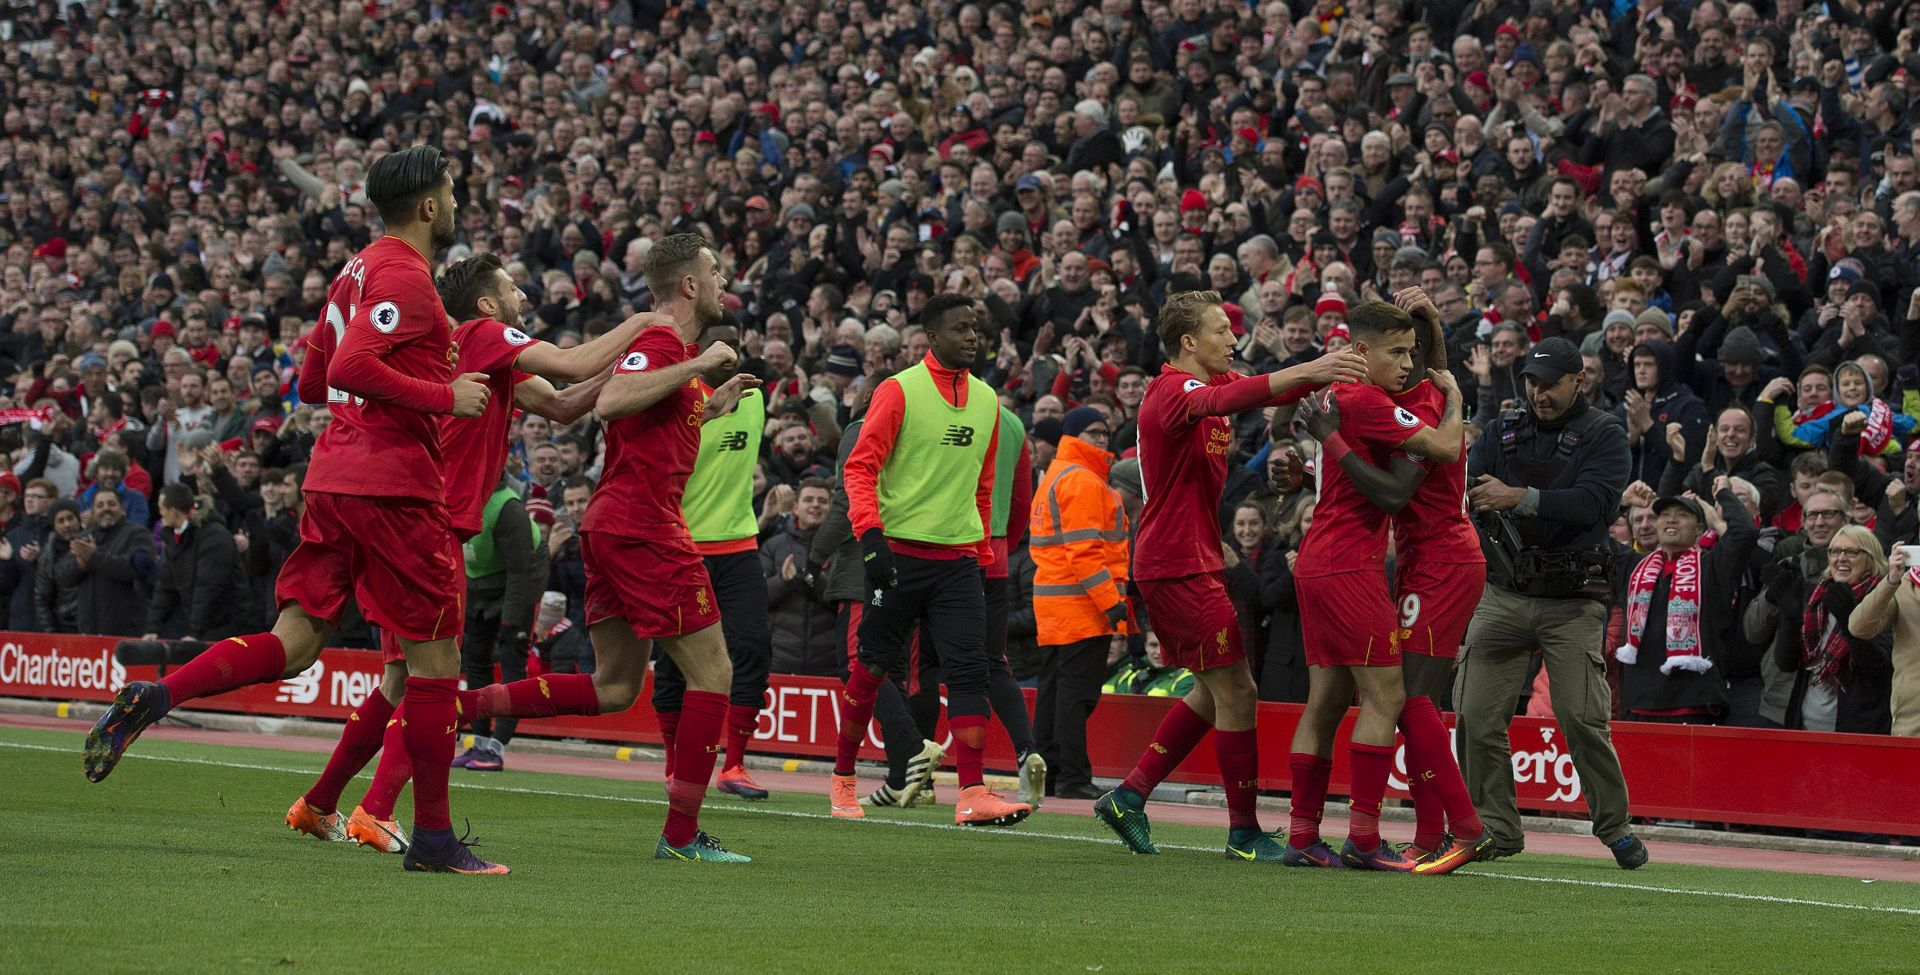 PREMIERLIGA Šestica Liverpoola za preuzimanje vrha tablice